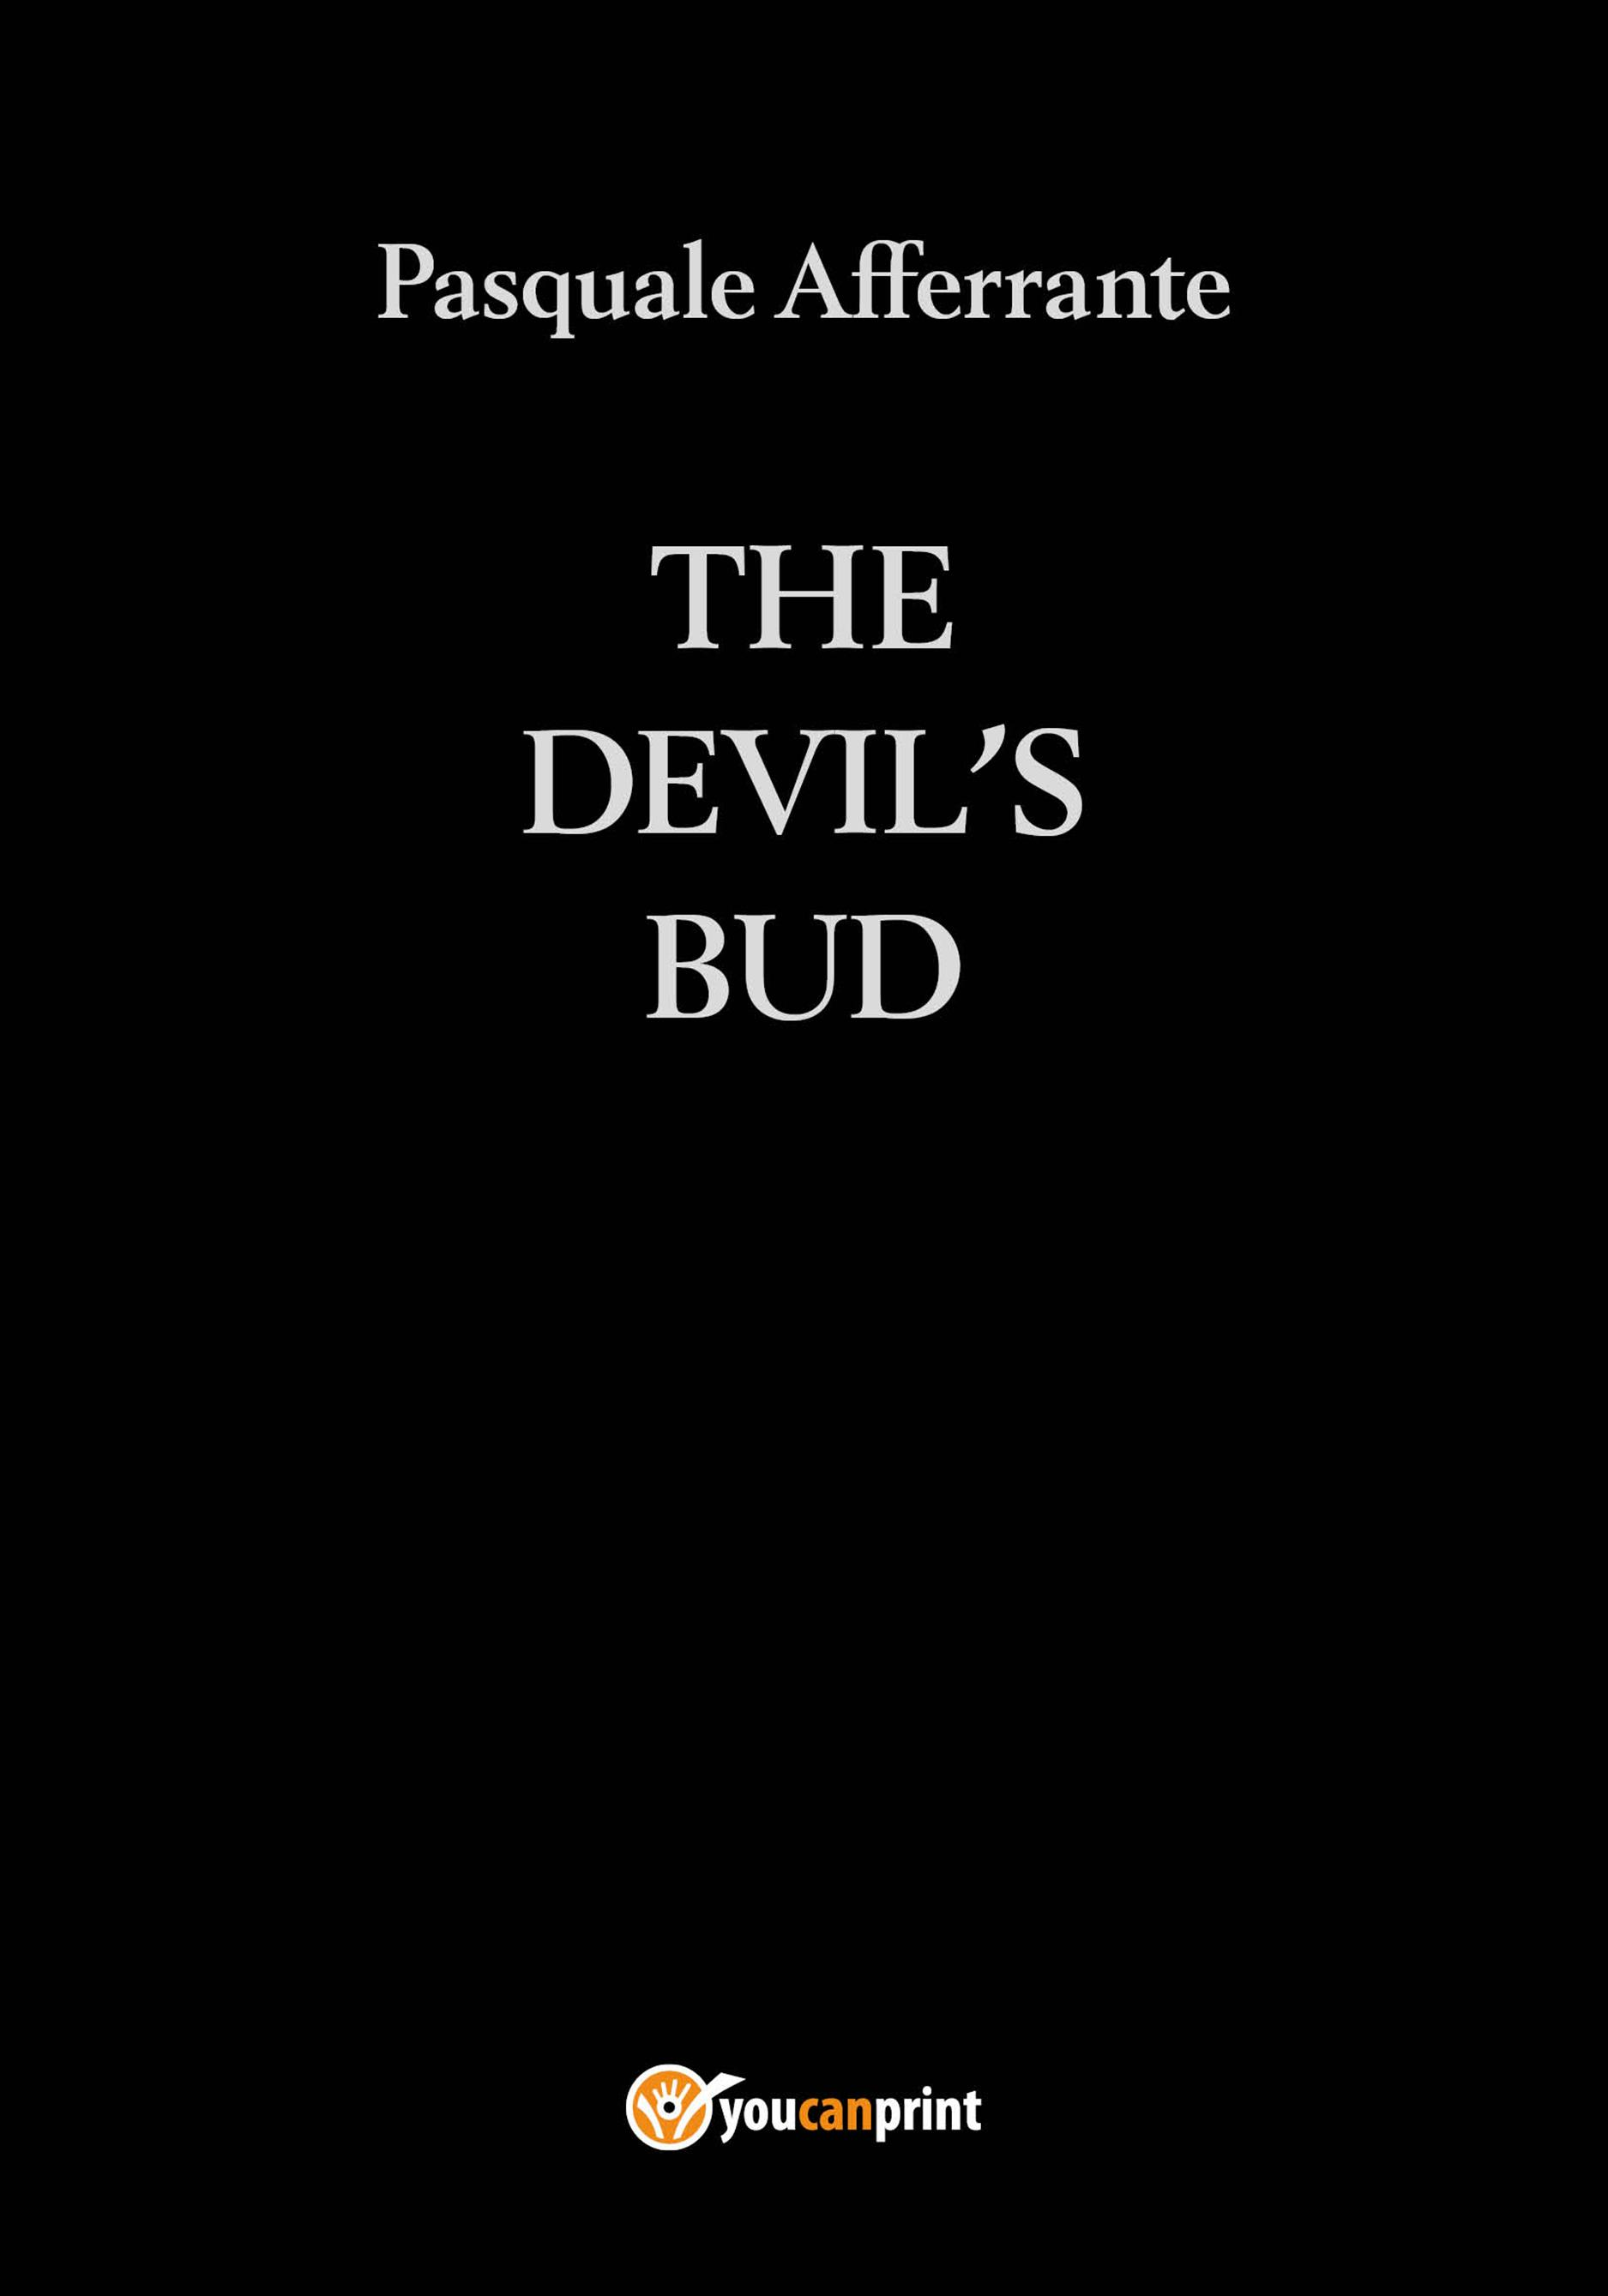 The Devil's Bud